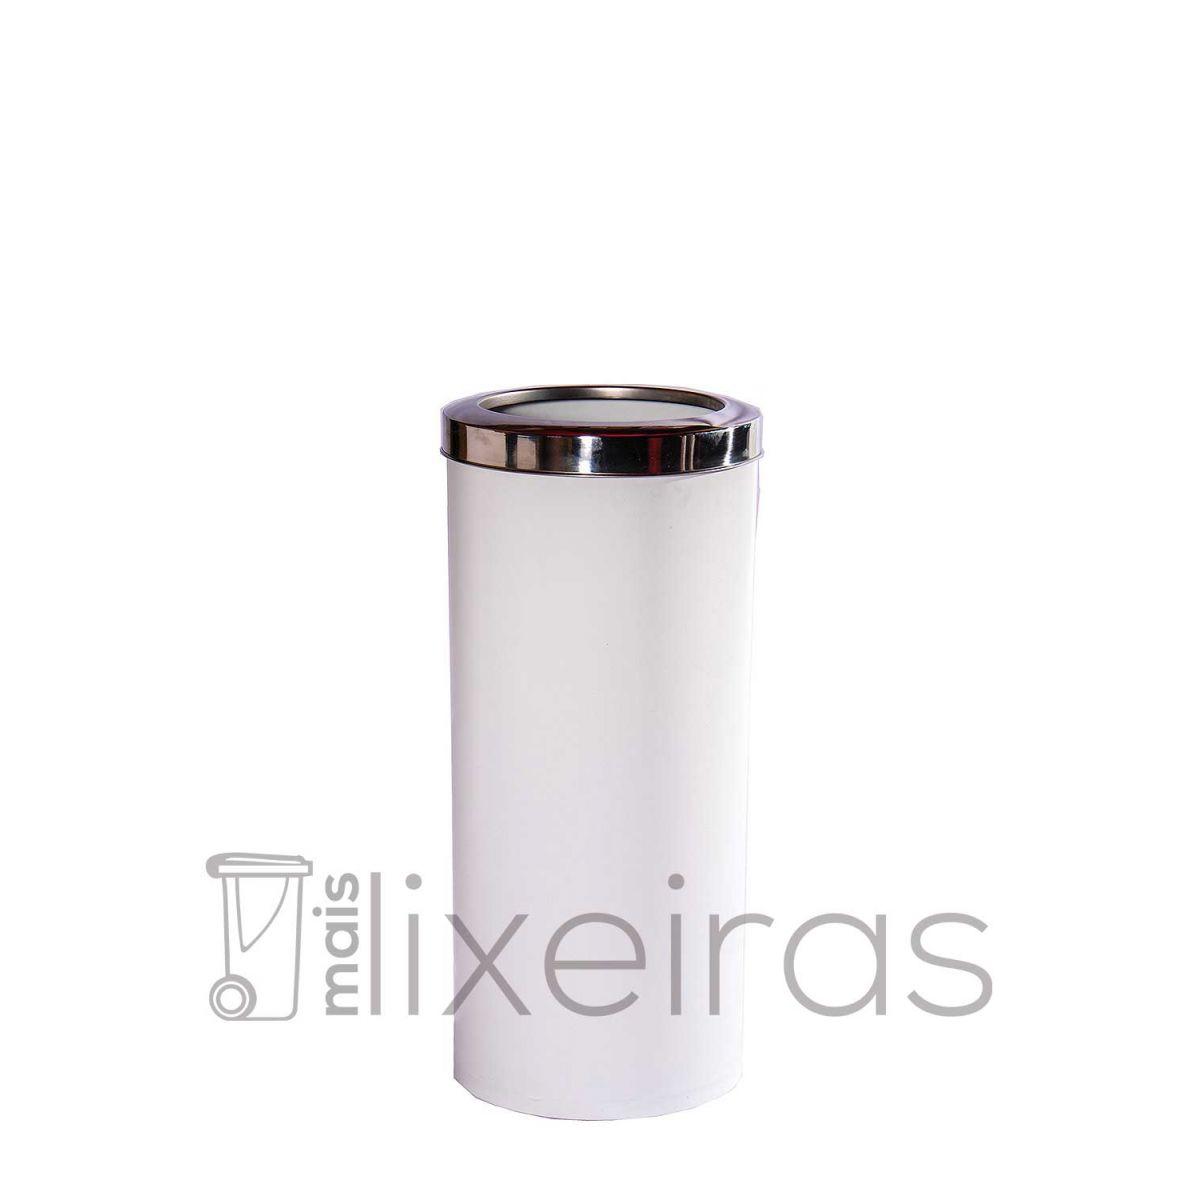 Lixeira plástica colorida com aro inox - 25 litros